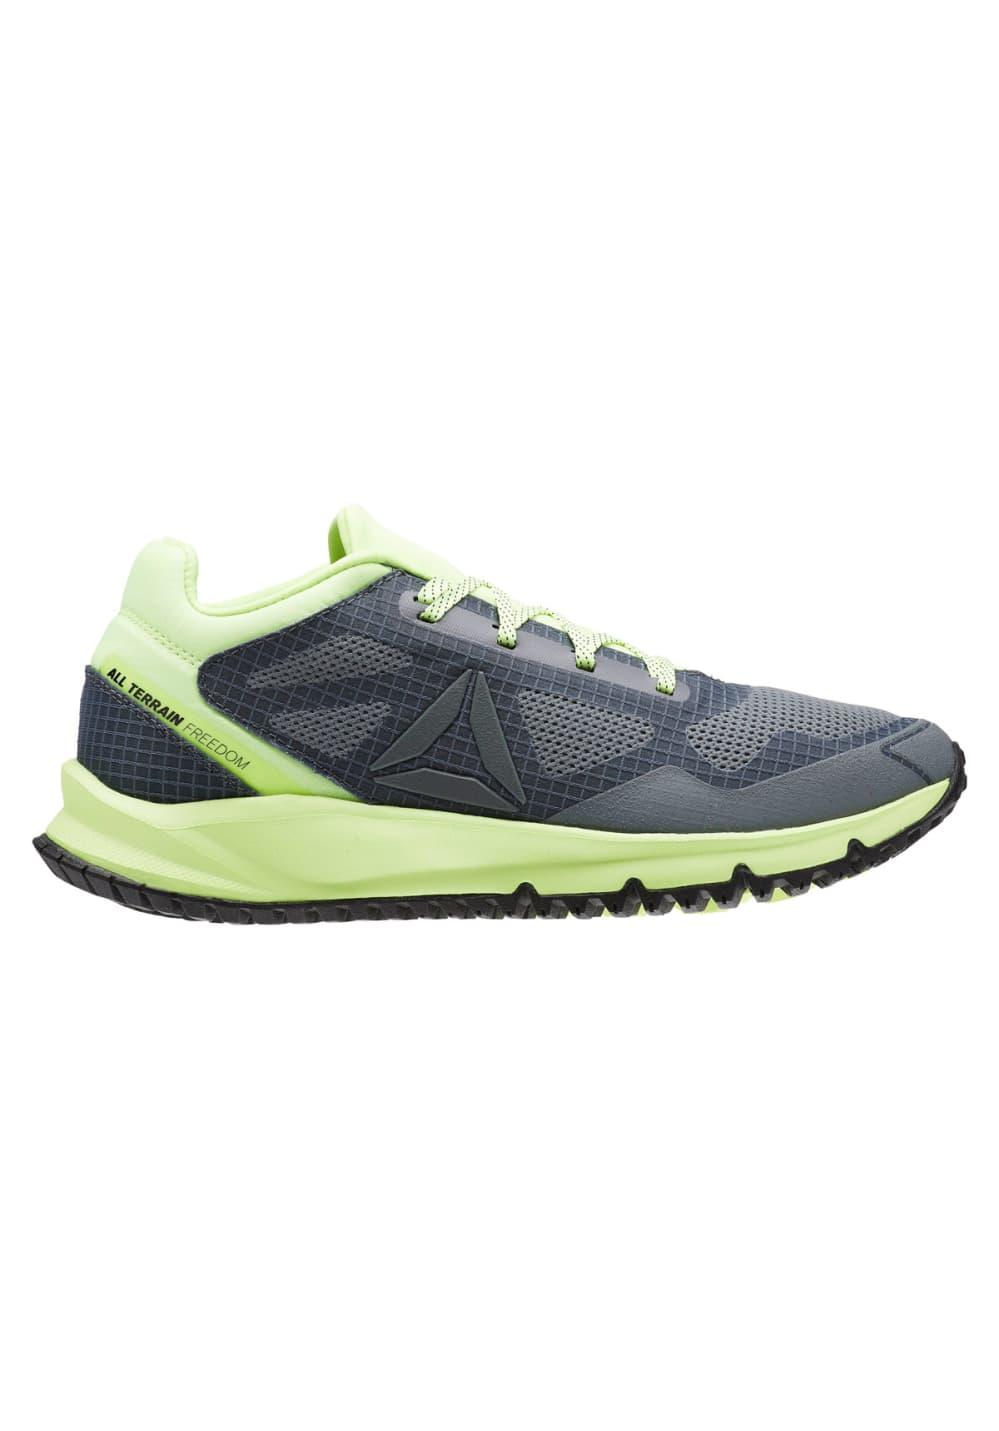 8ac49e7a Reebok All Terrain Freedom Ex - Running shoes for Men - Grey